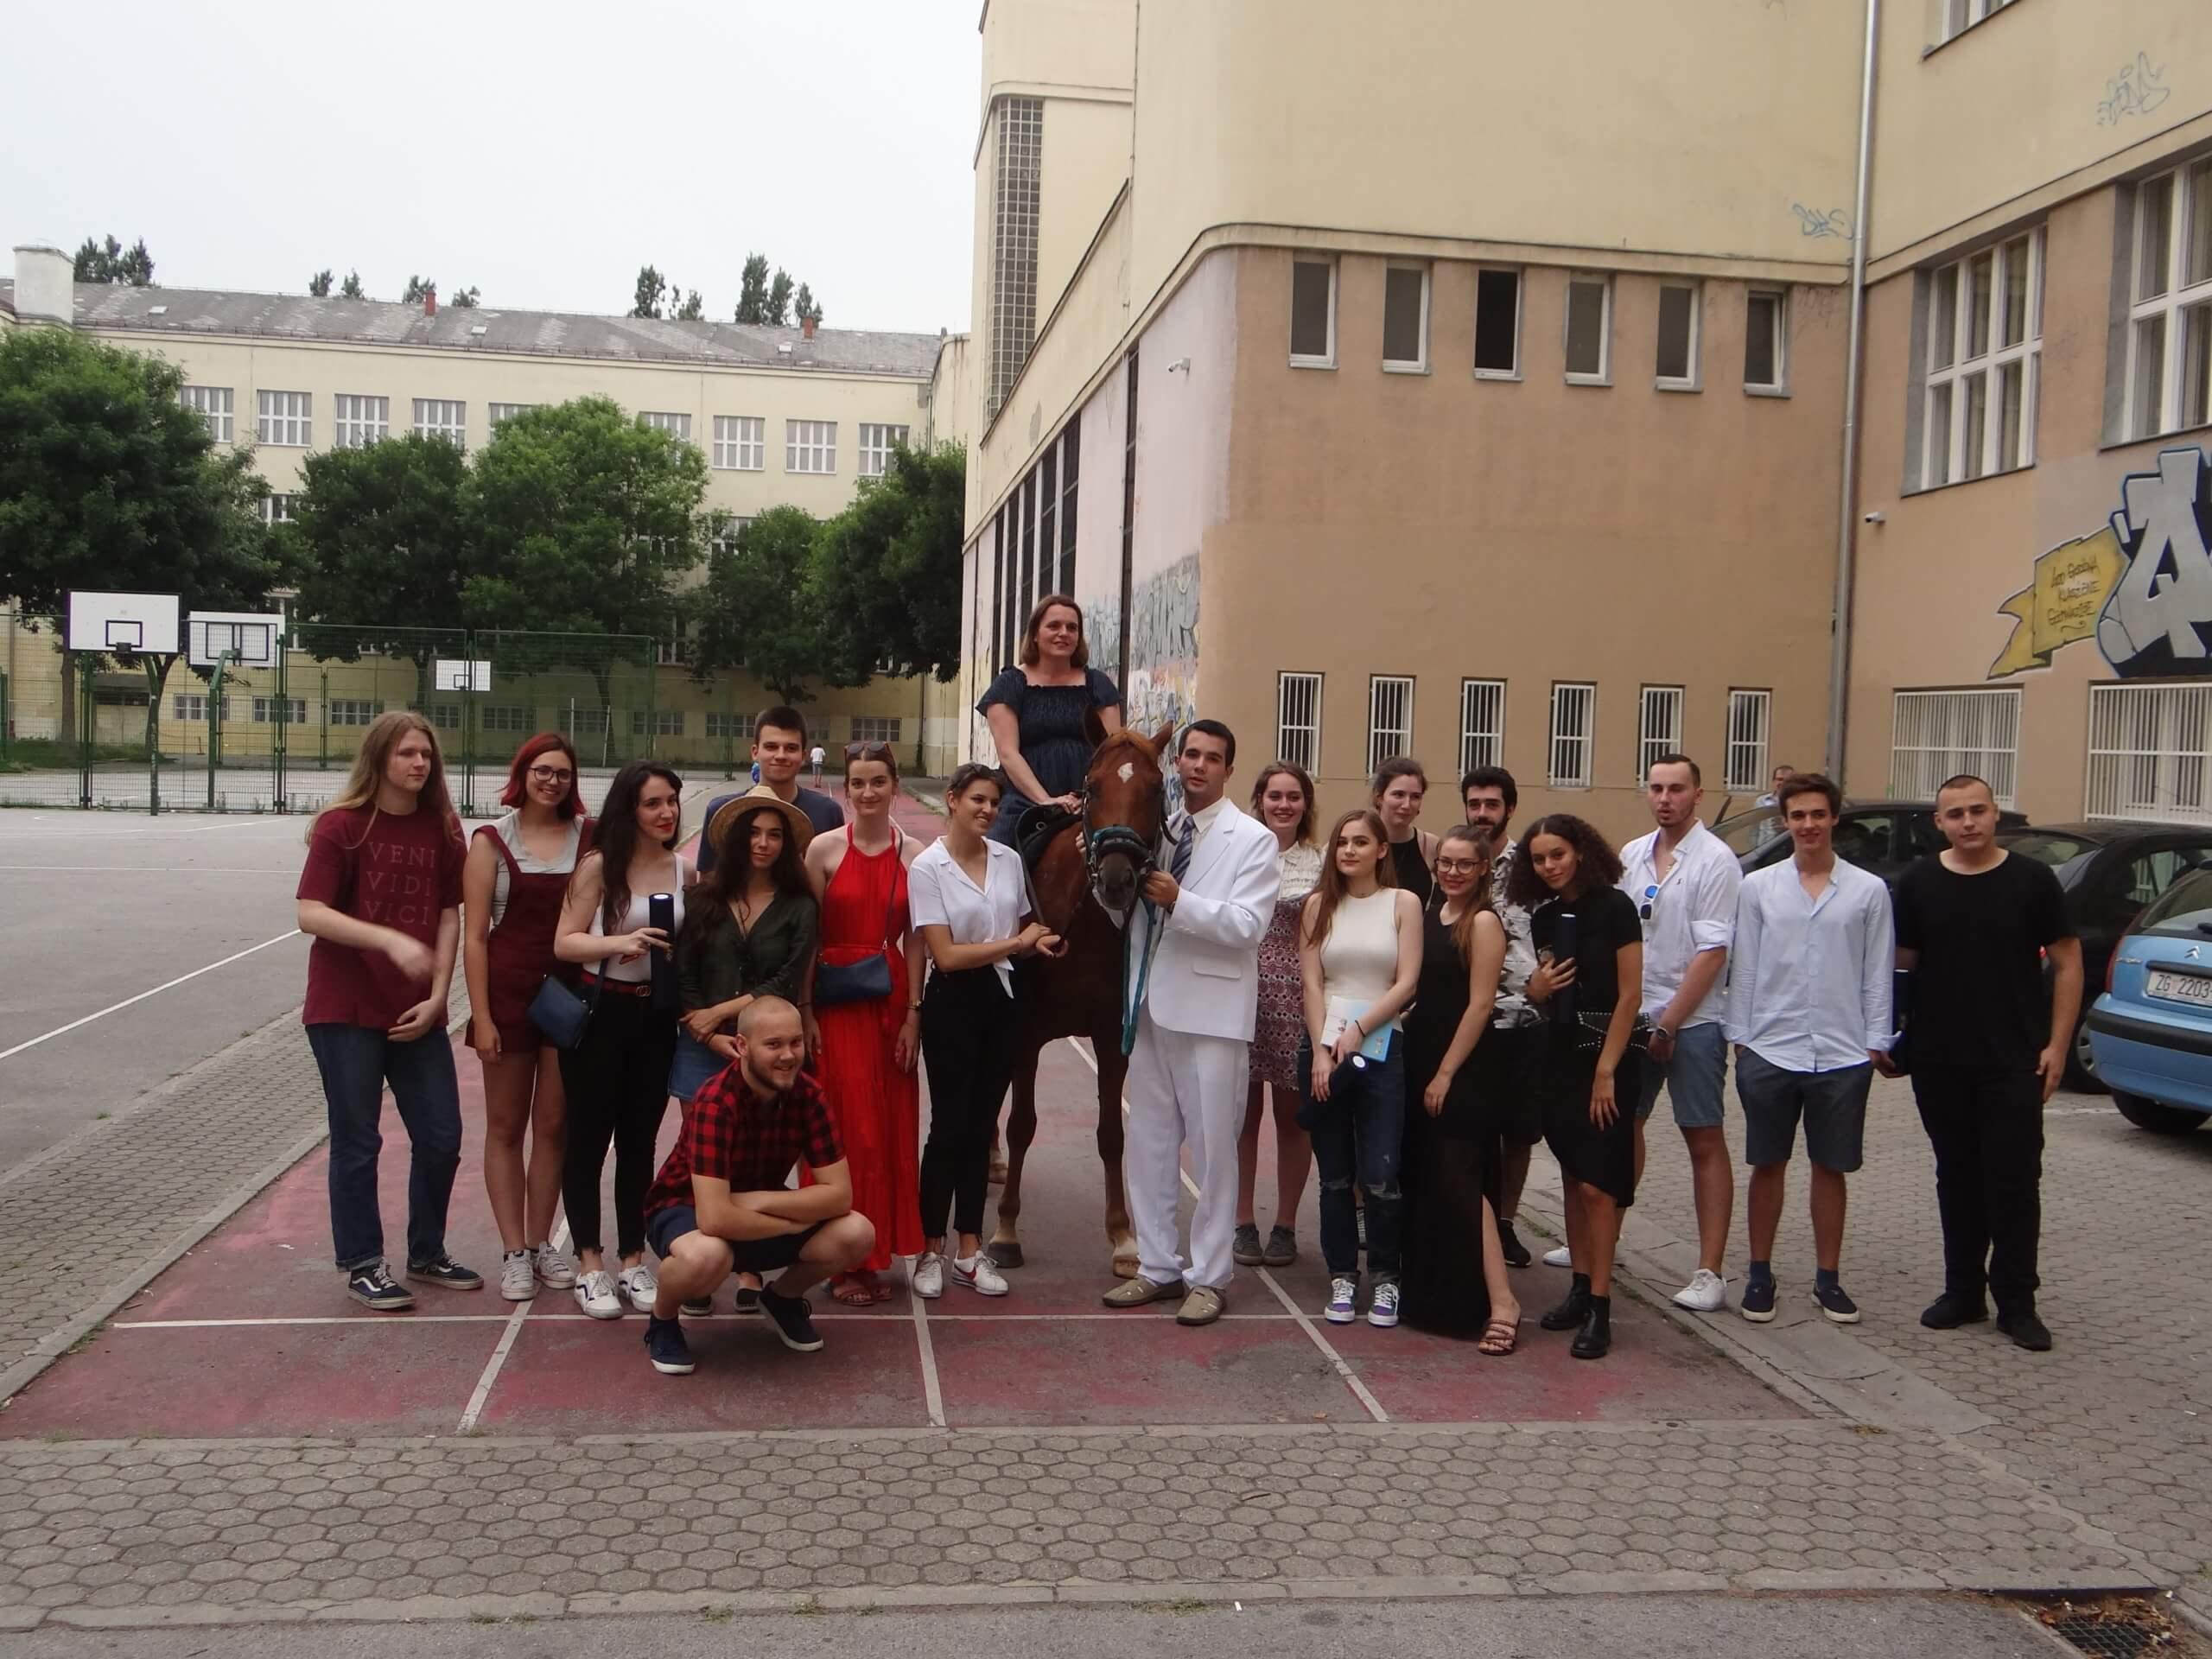 Pred zagrebačkom školom pojavio se na konju: Razred je bio oduševljen